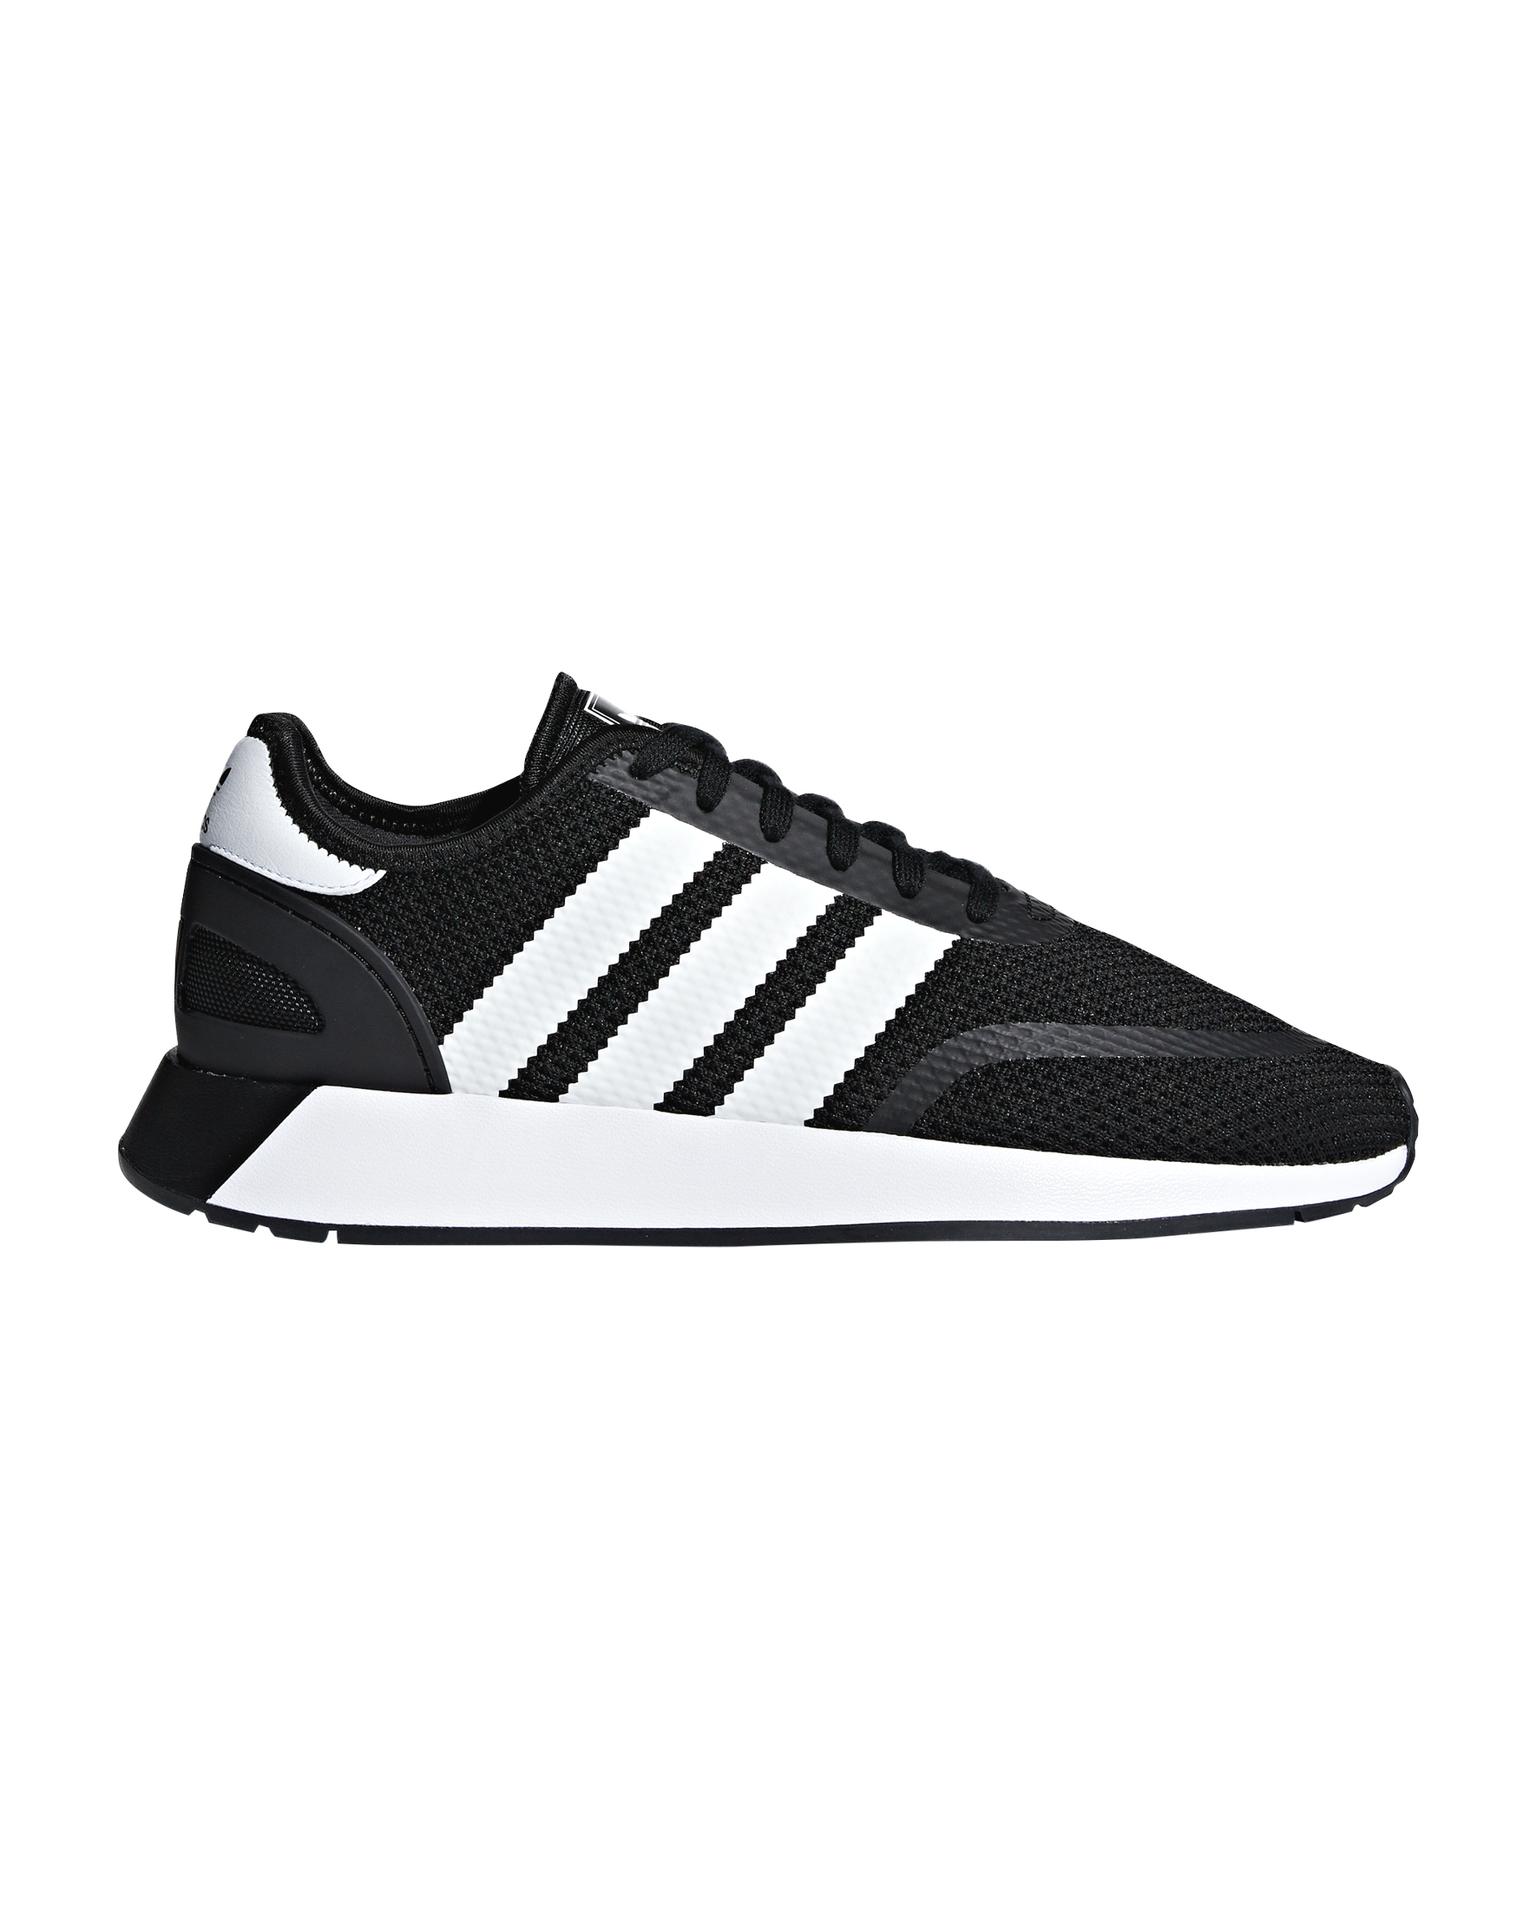 ADIDAS ORIGINALS U PATH RUN, férfi cipő, G27639 42 23